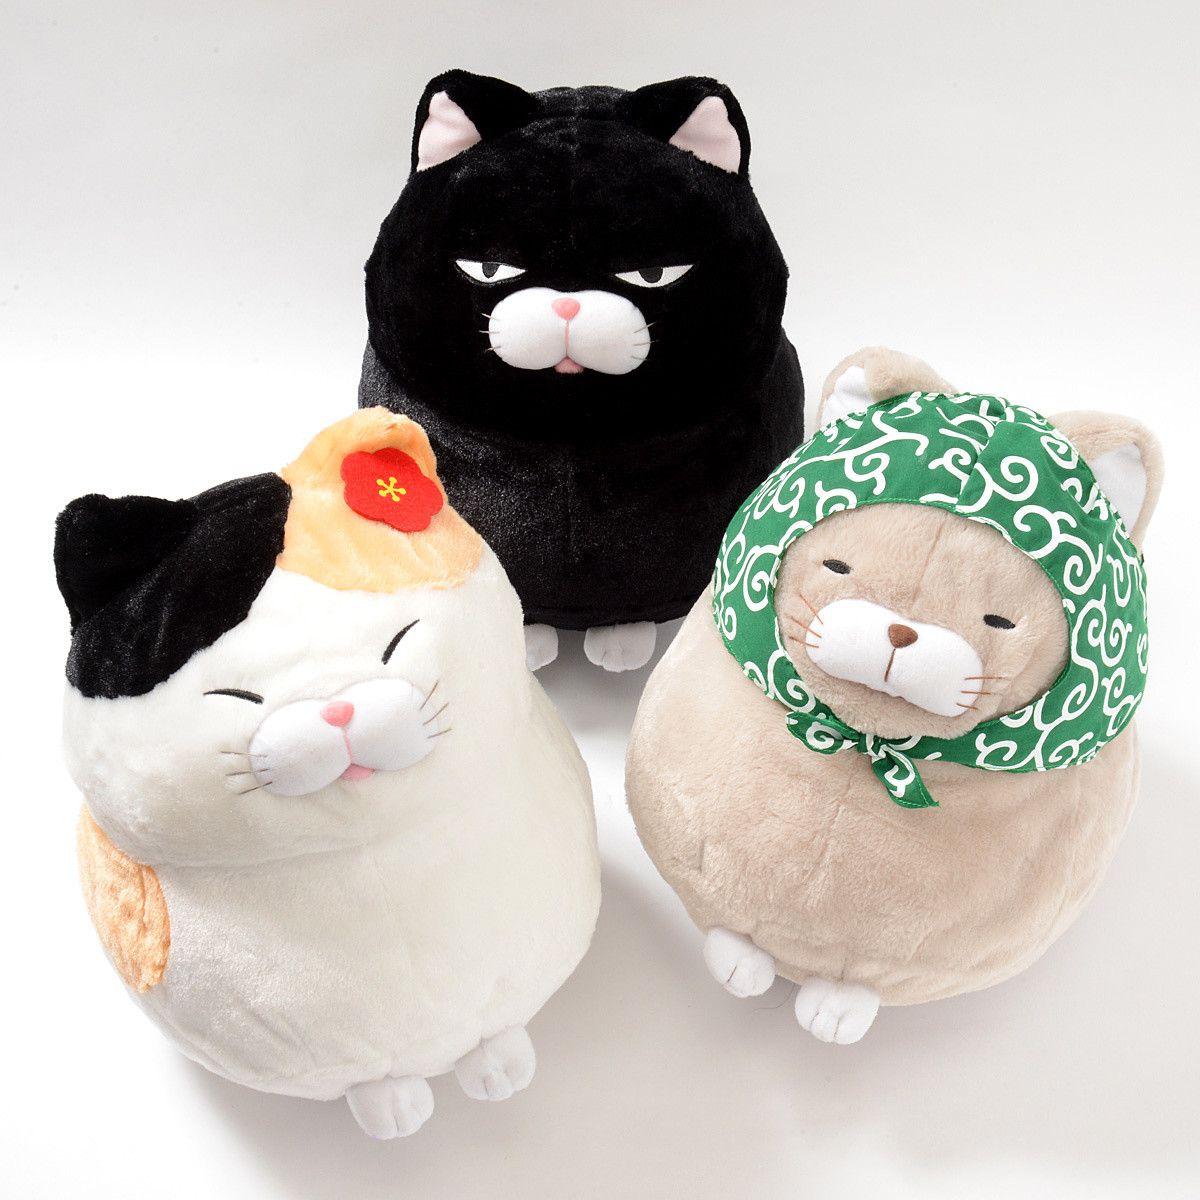 Hige Manjyu Fuku Cat Plush Collection (Big) Kawaii plush